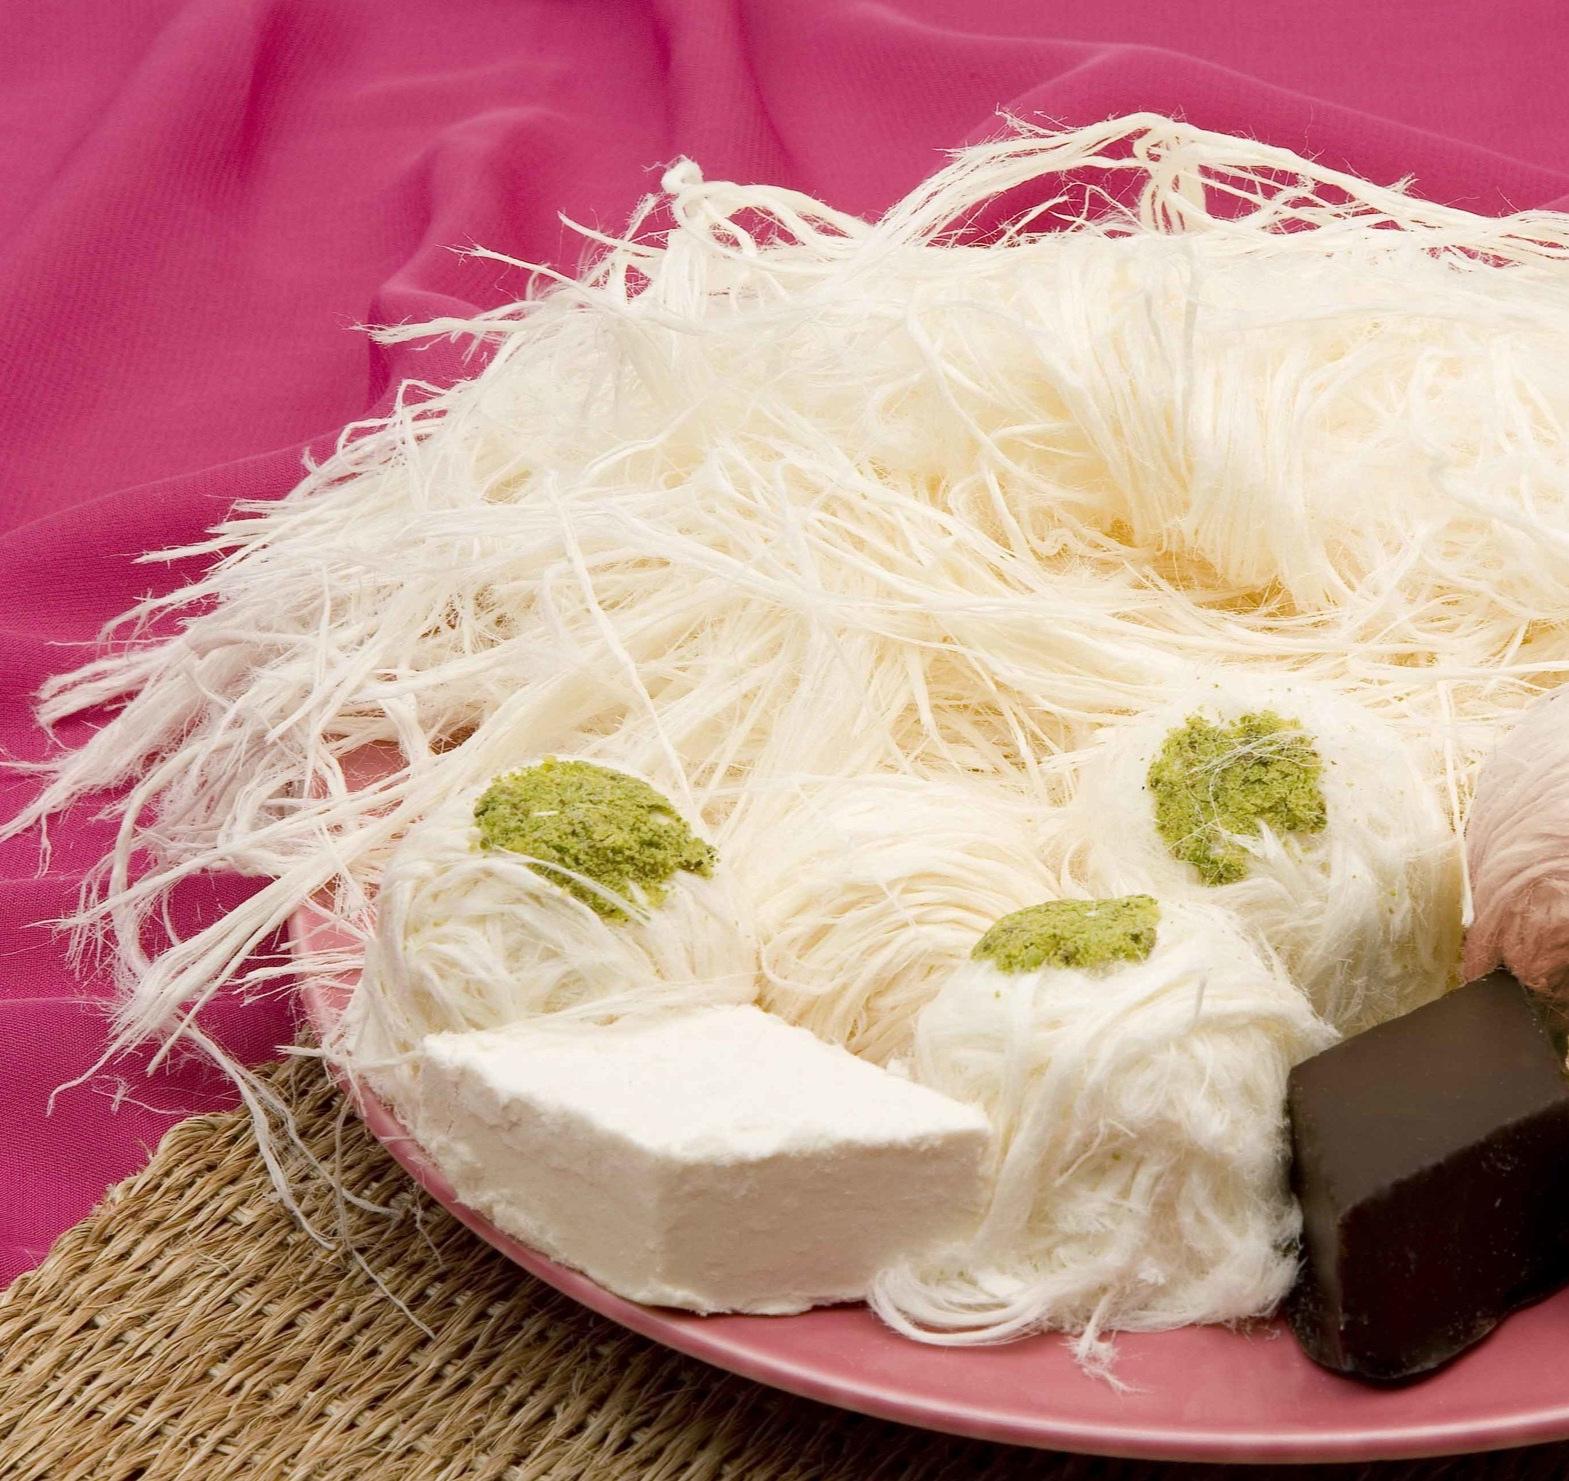 Pişmaniye  a sweet stringy dessert